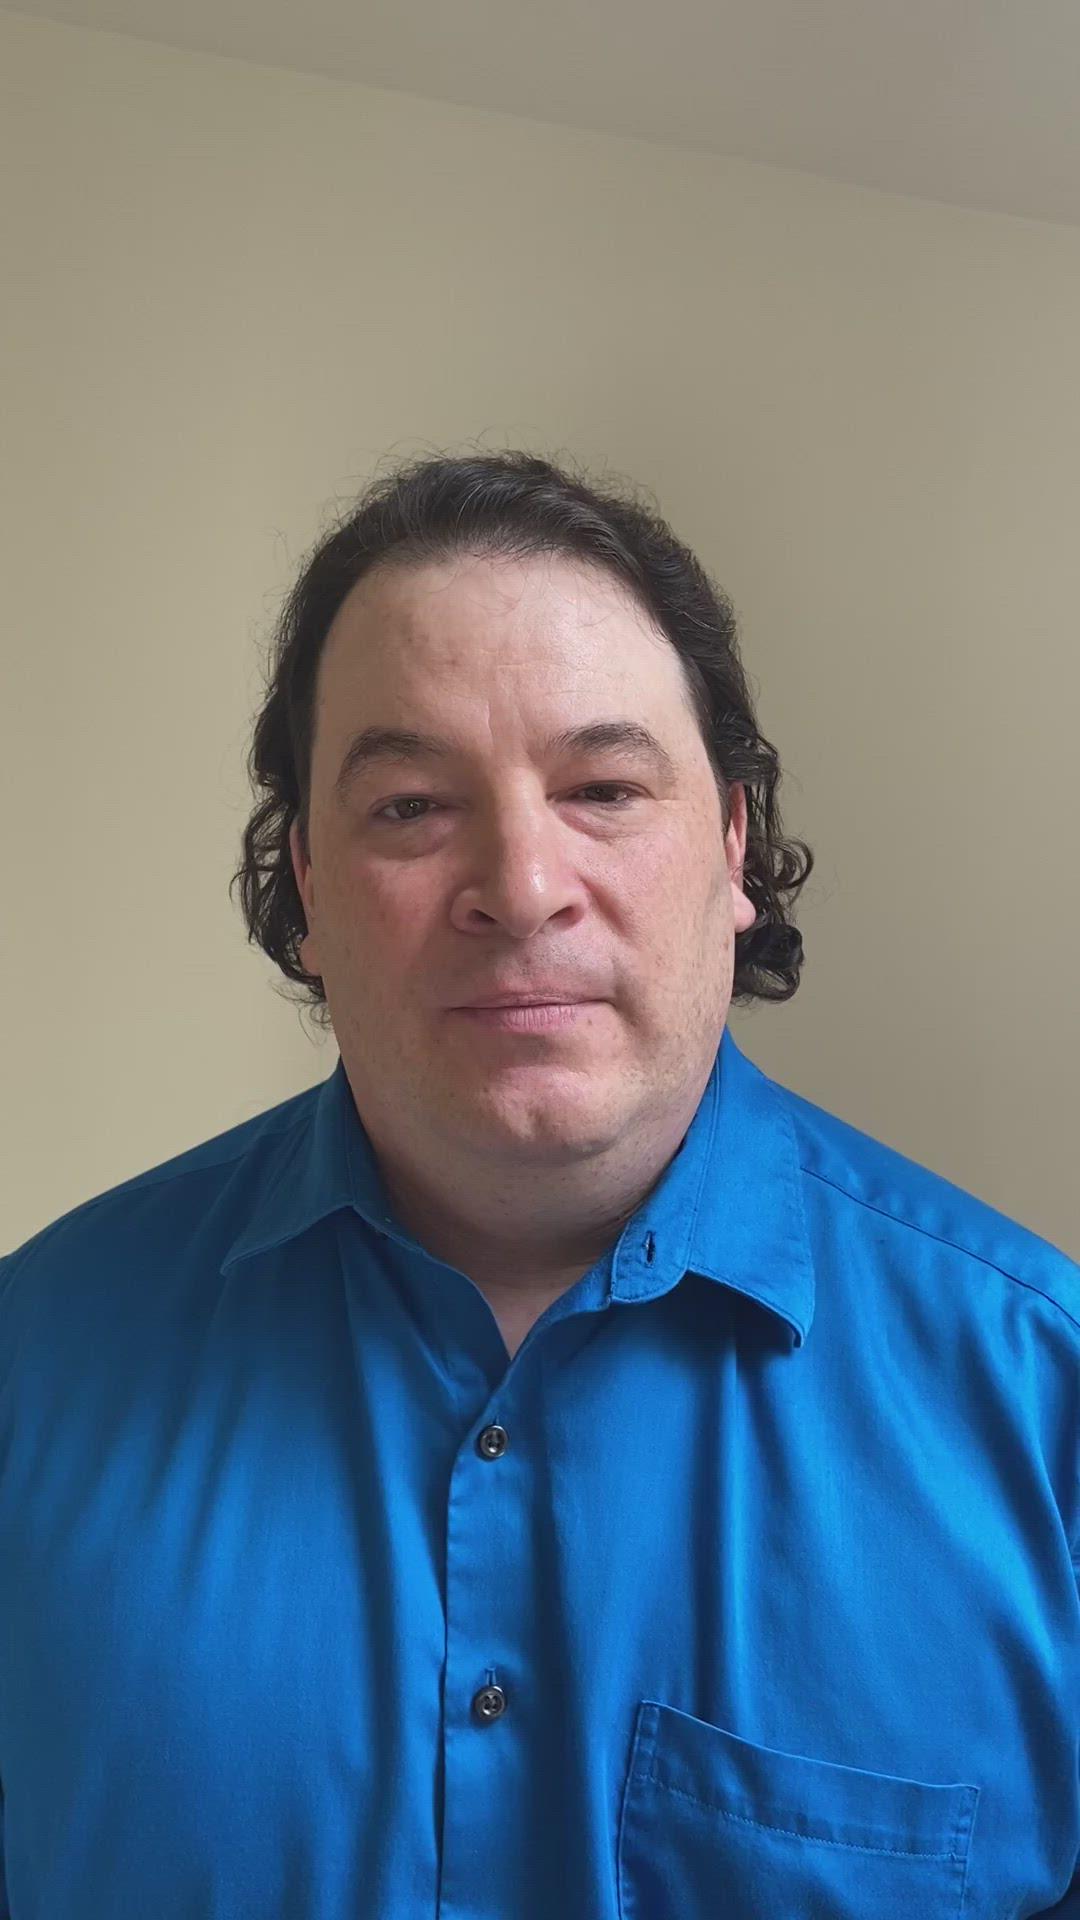 Photo of David Bromberg, Psychologist